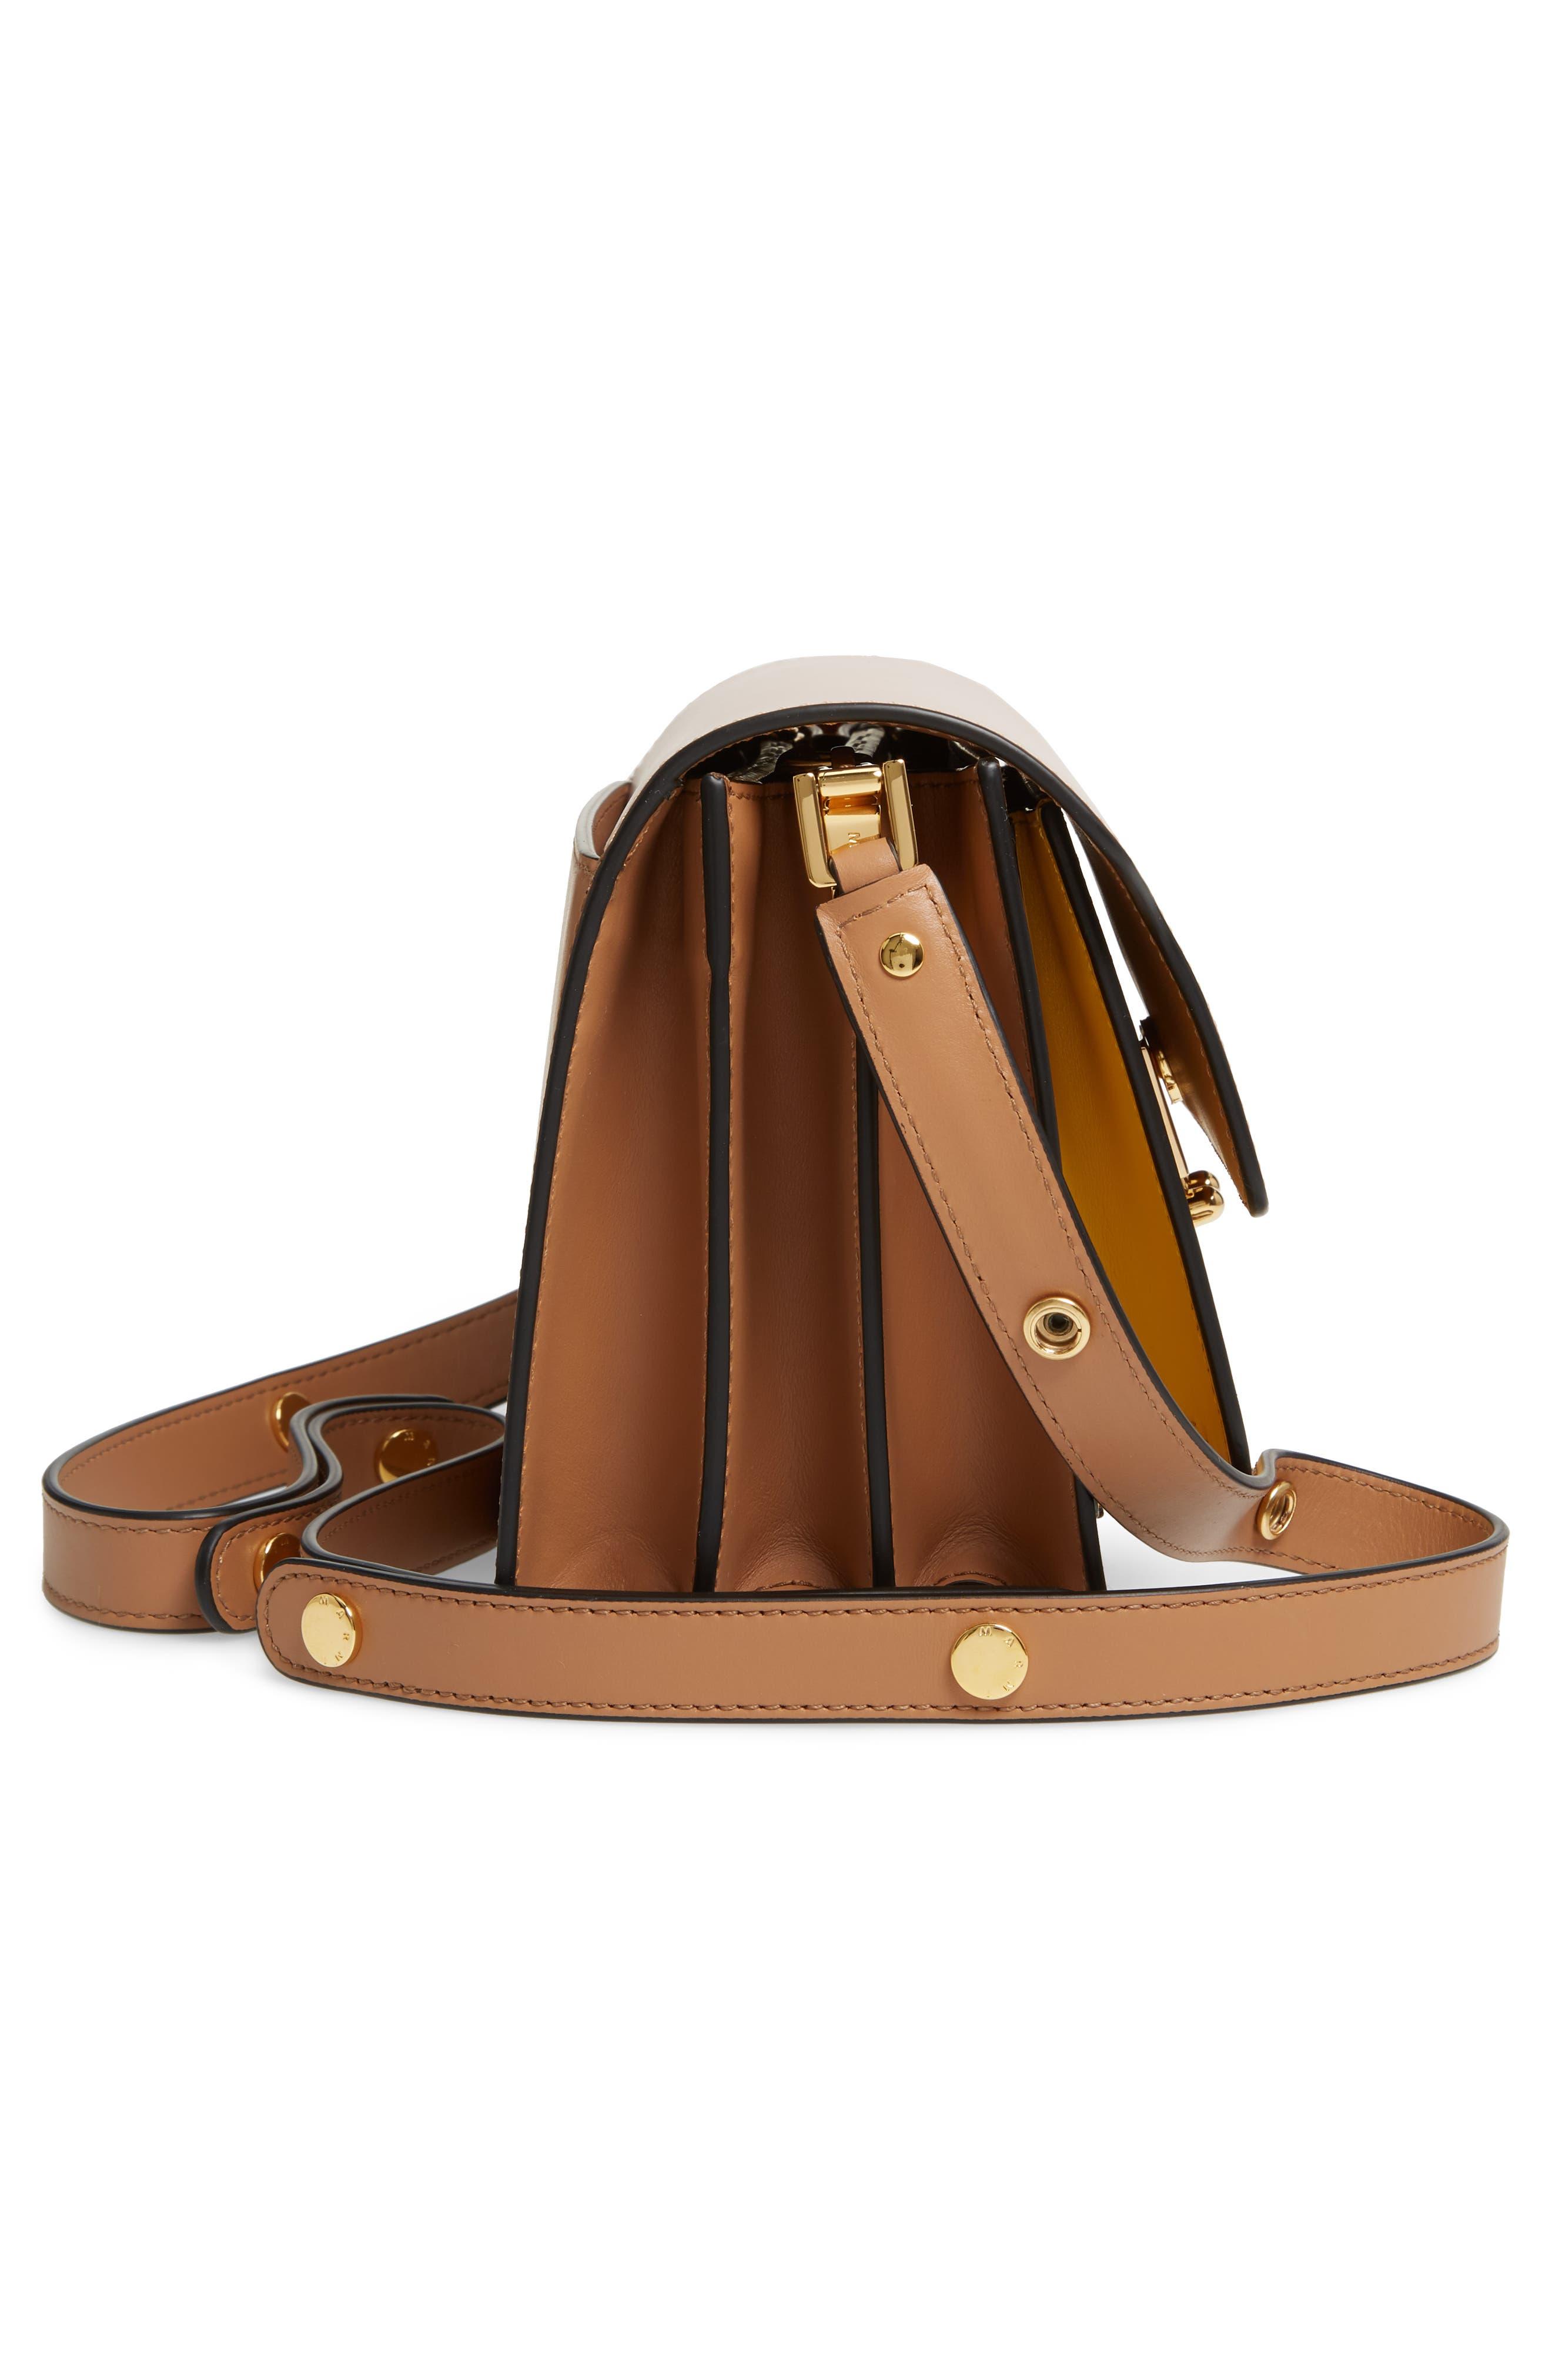 MARNI,                             Trunk Colorblock Leather Shoulder Bag,                             Alternate thumbnail 5, color,                             QUARTZ/ SUNO/ POMPEII